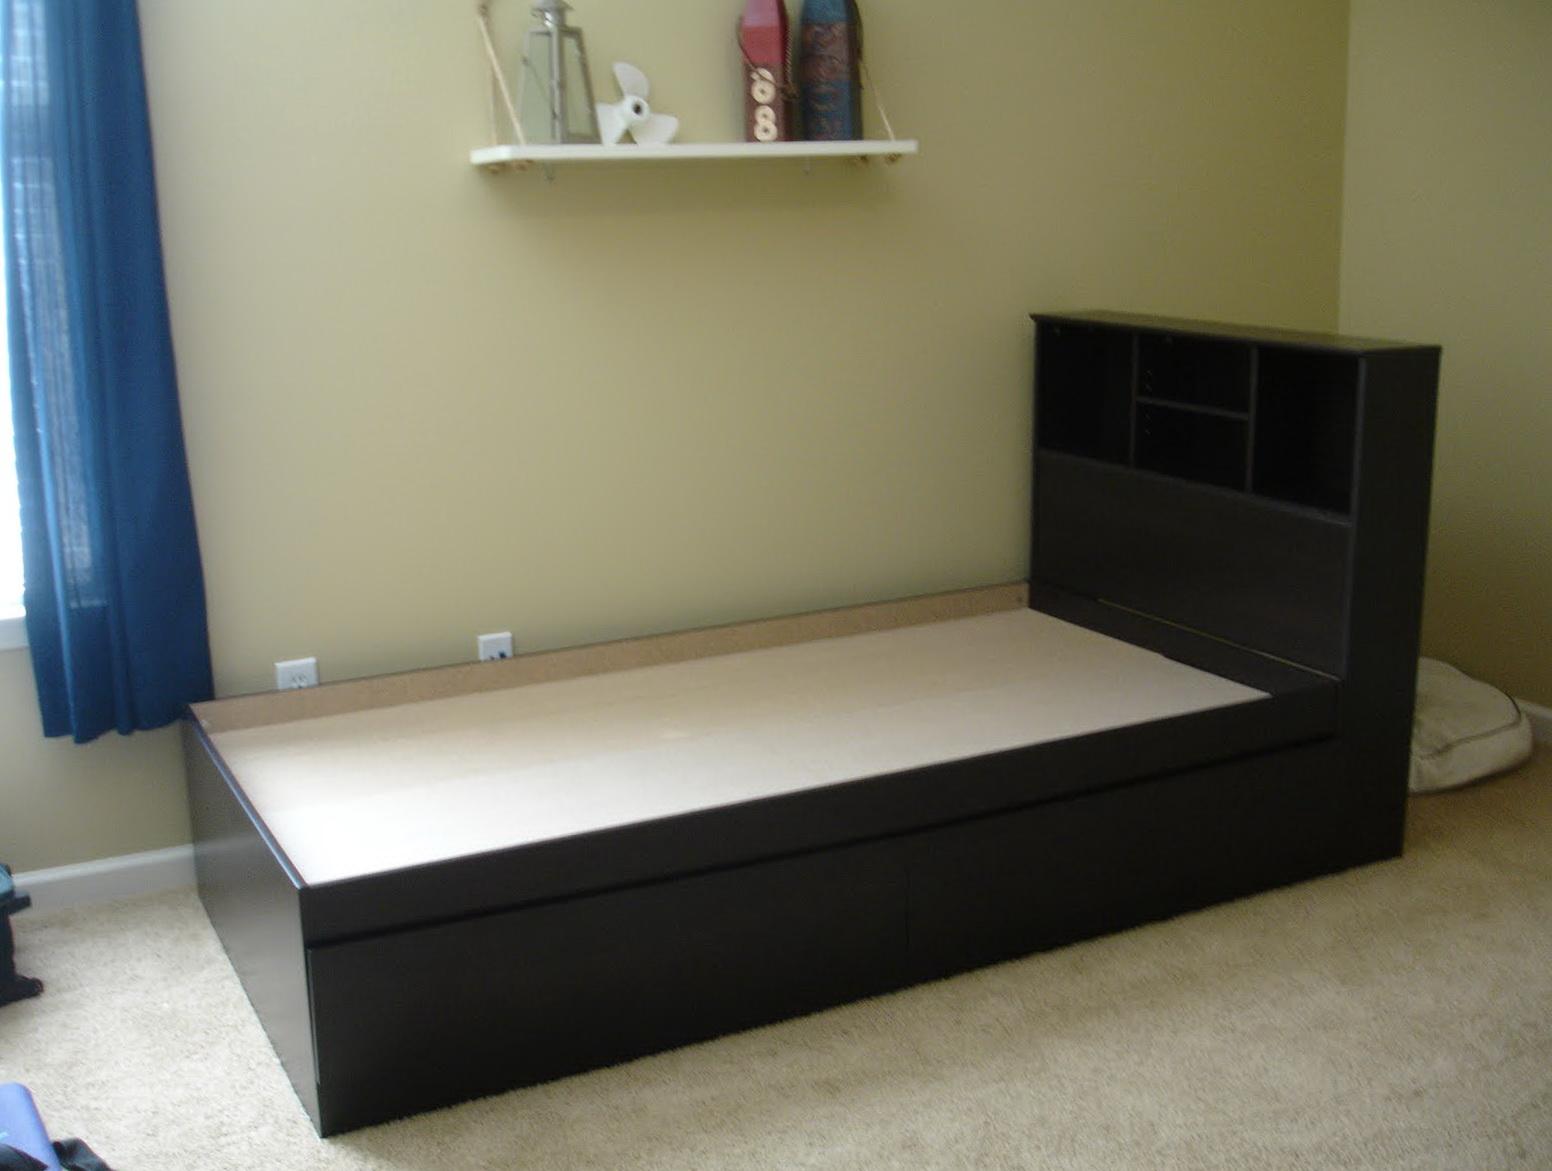 Diy Headboard For Twin Bed